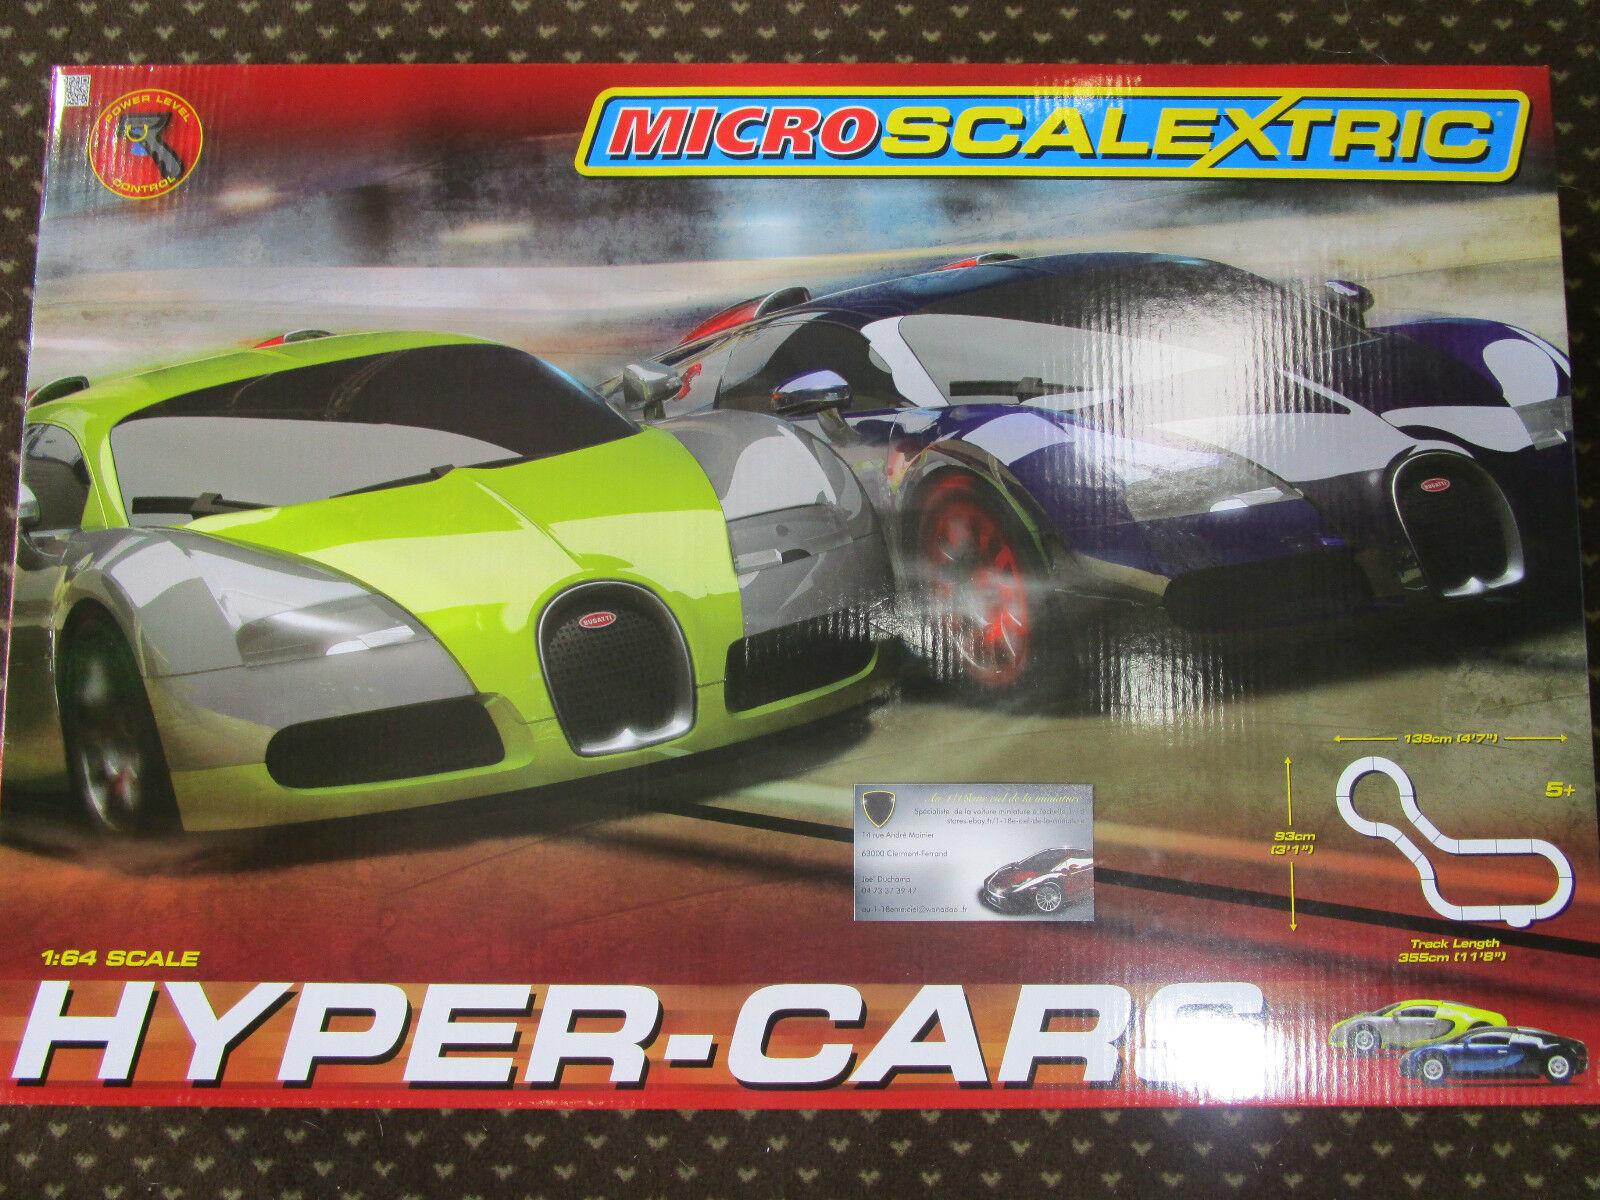 COFFRET CIRCUIT HYPER CARS au 1 64 MICRO SCALEXTRIC G1108 SOLT